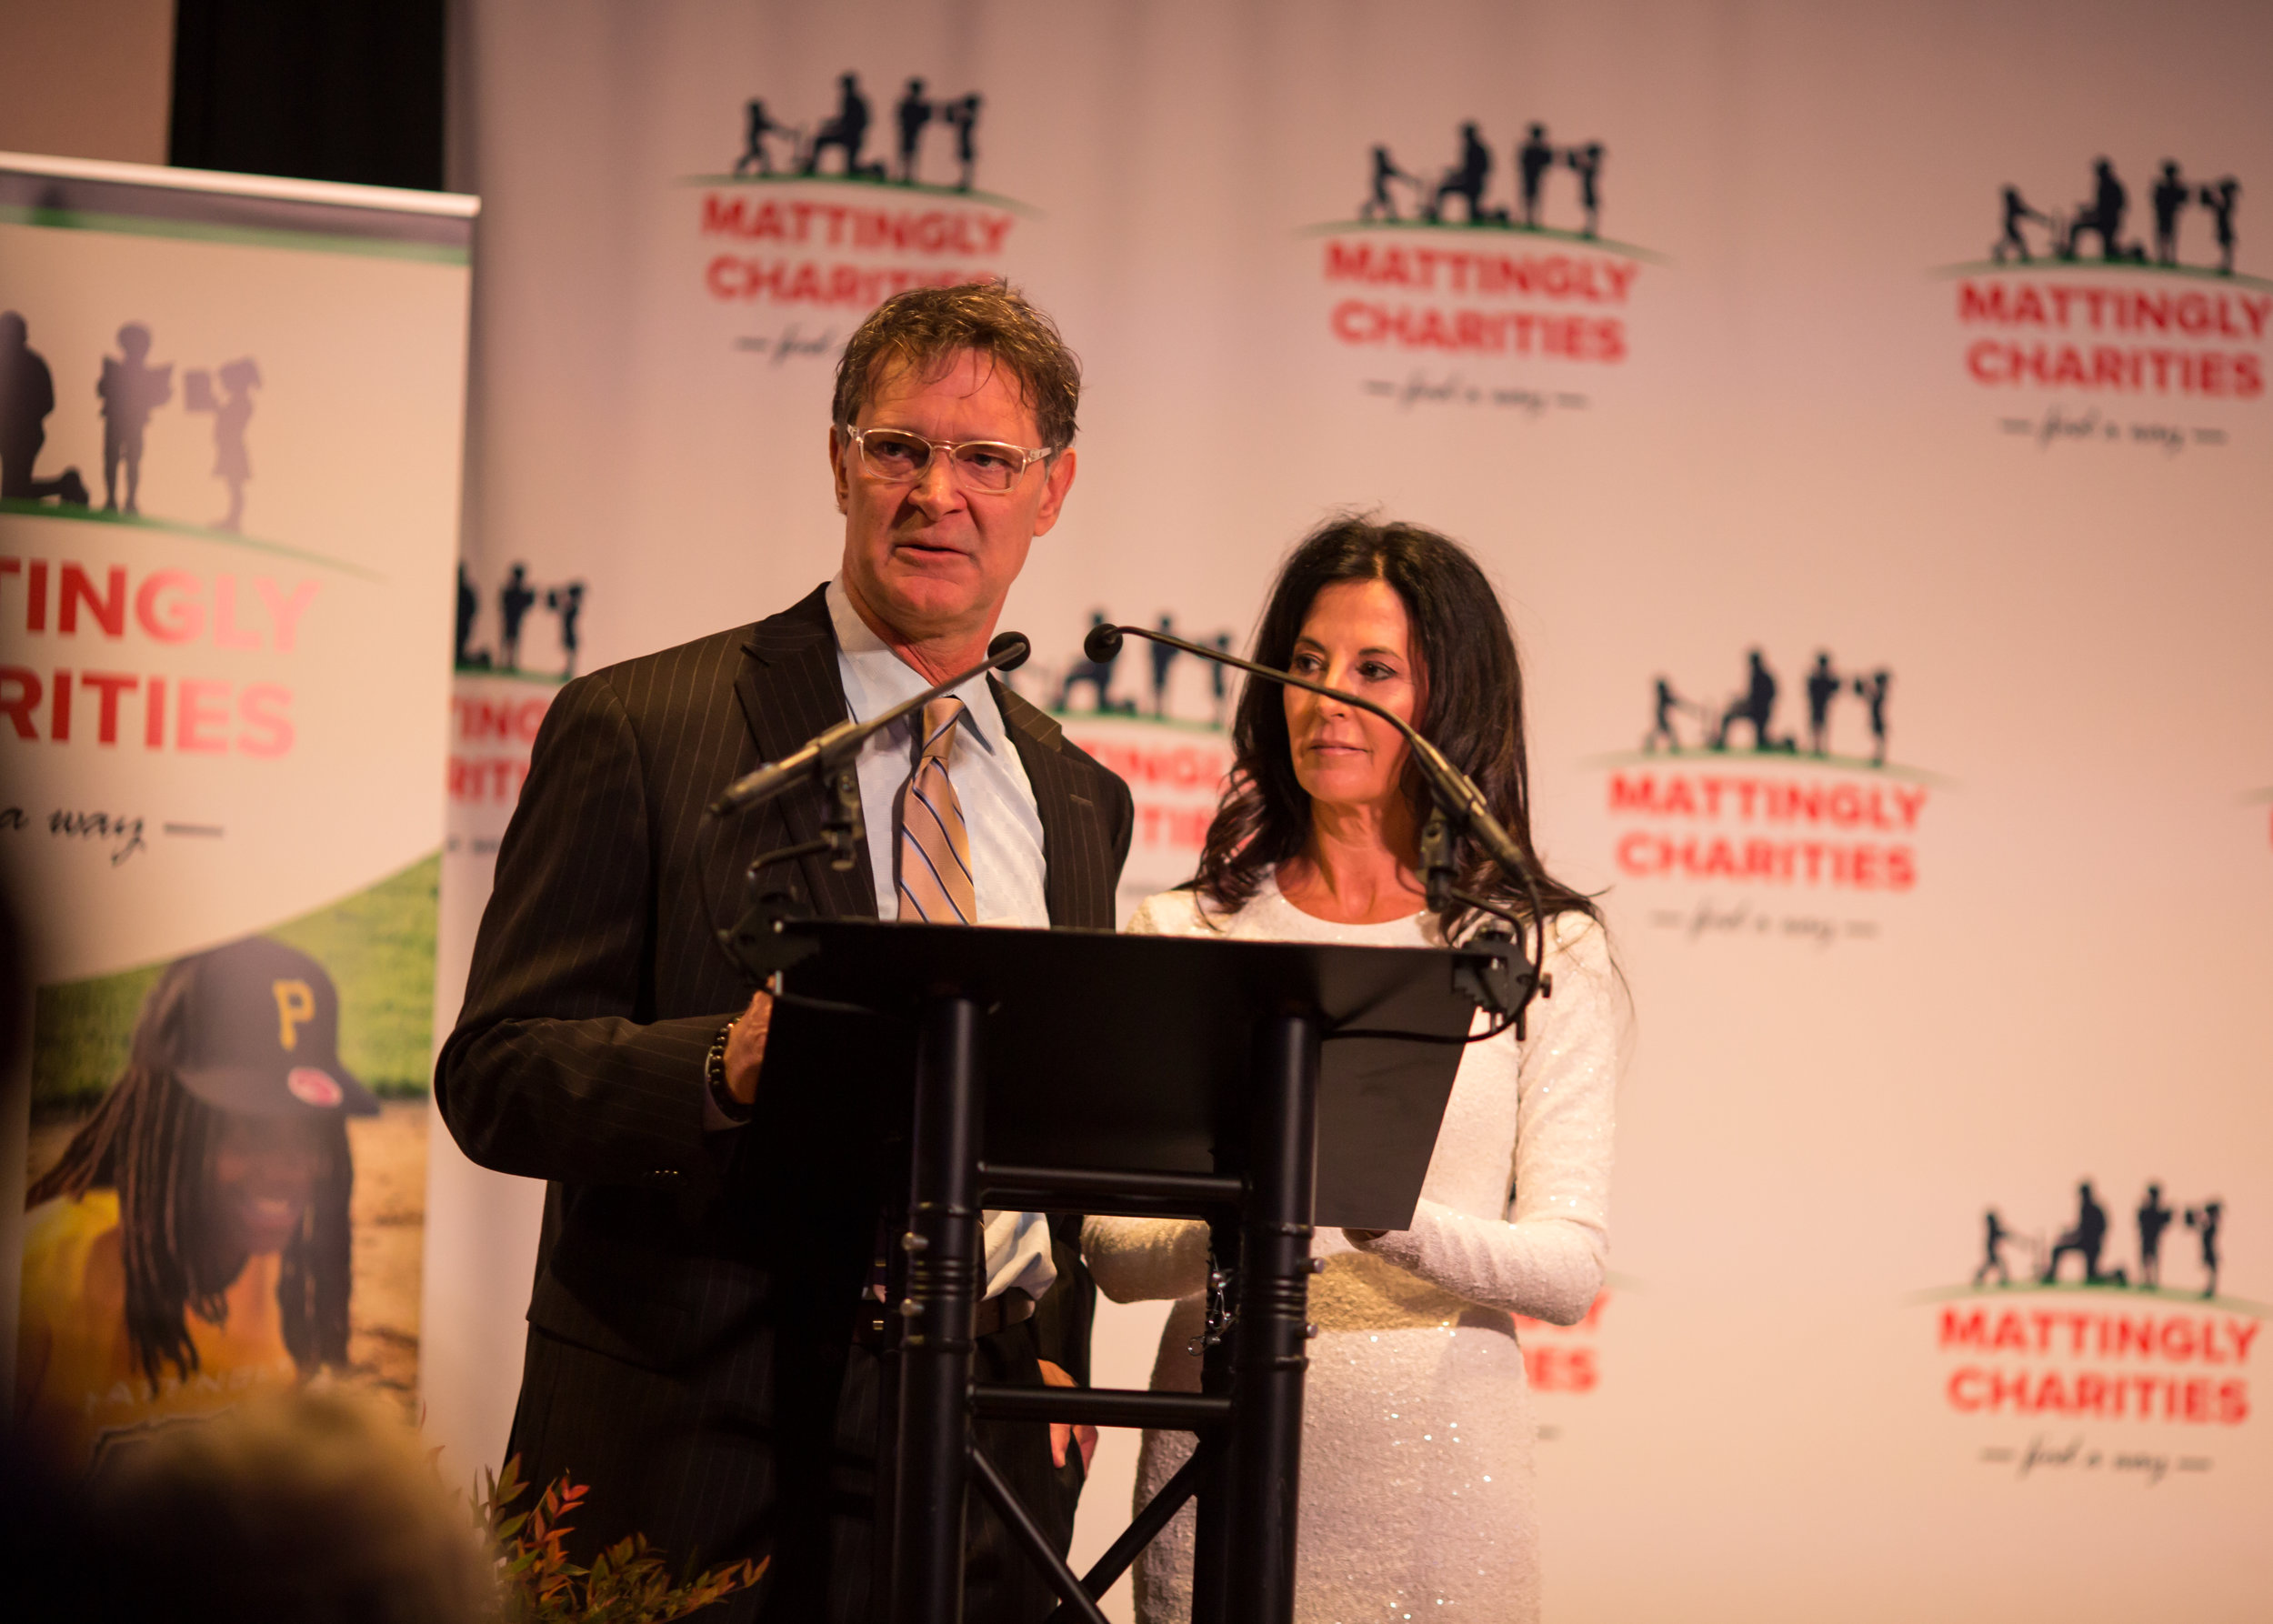 1-10-2019 Mattingly Charity Event-129.jpg